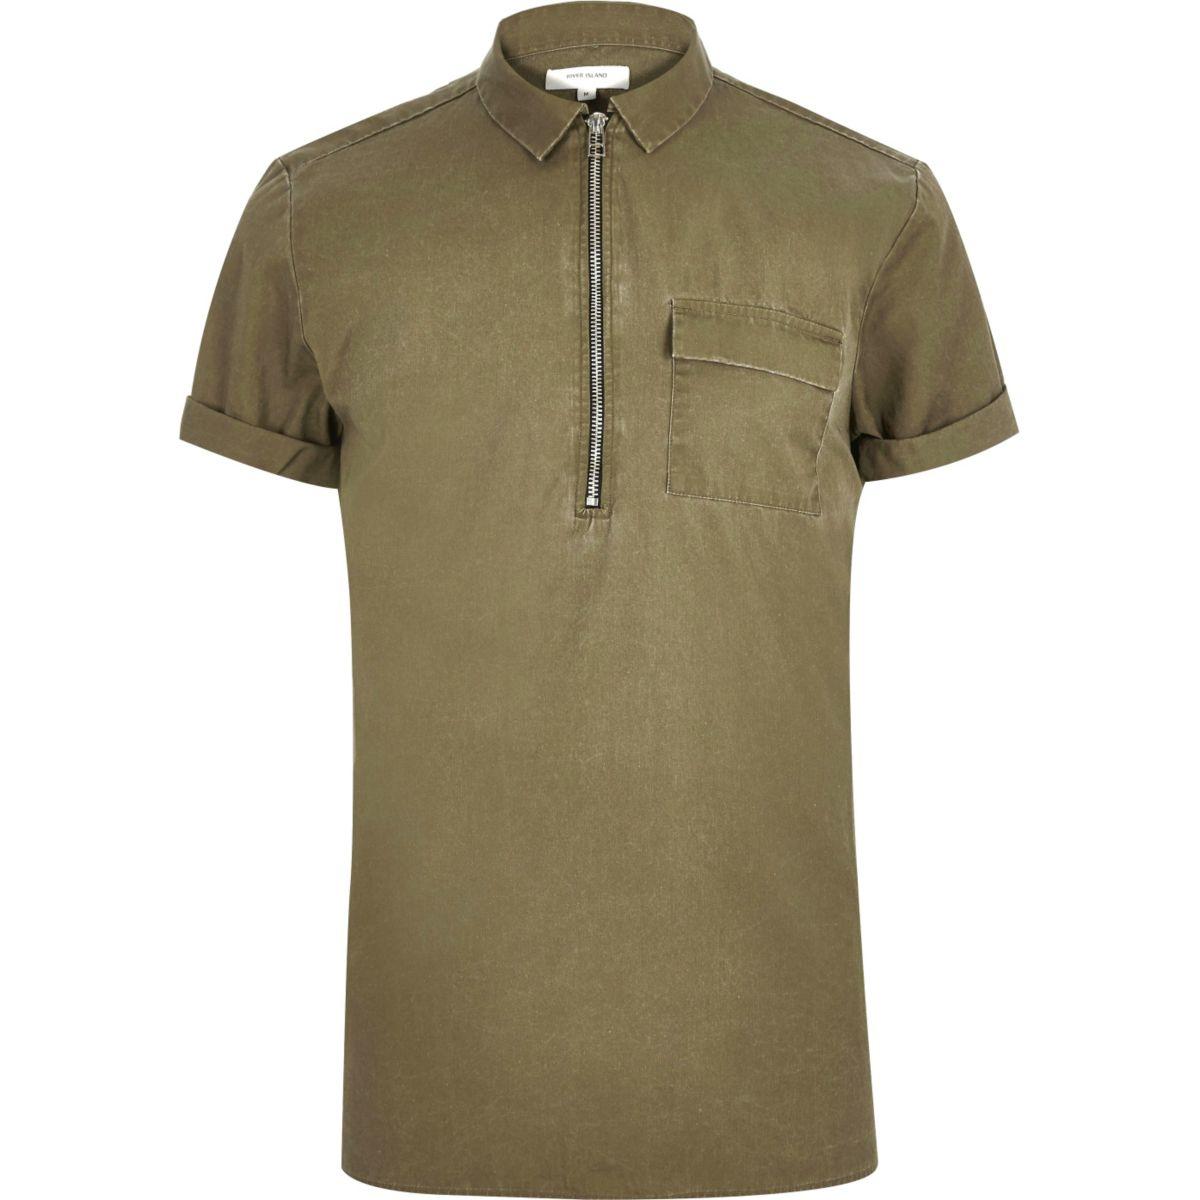 Washed green zip neck short sleeve top